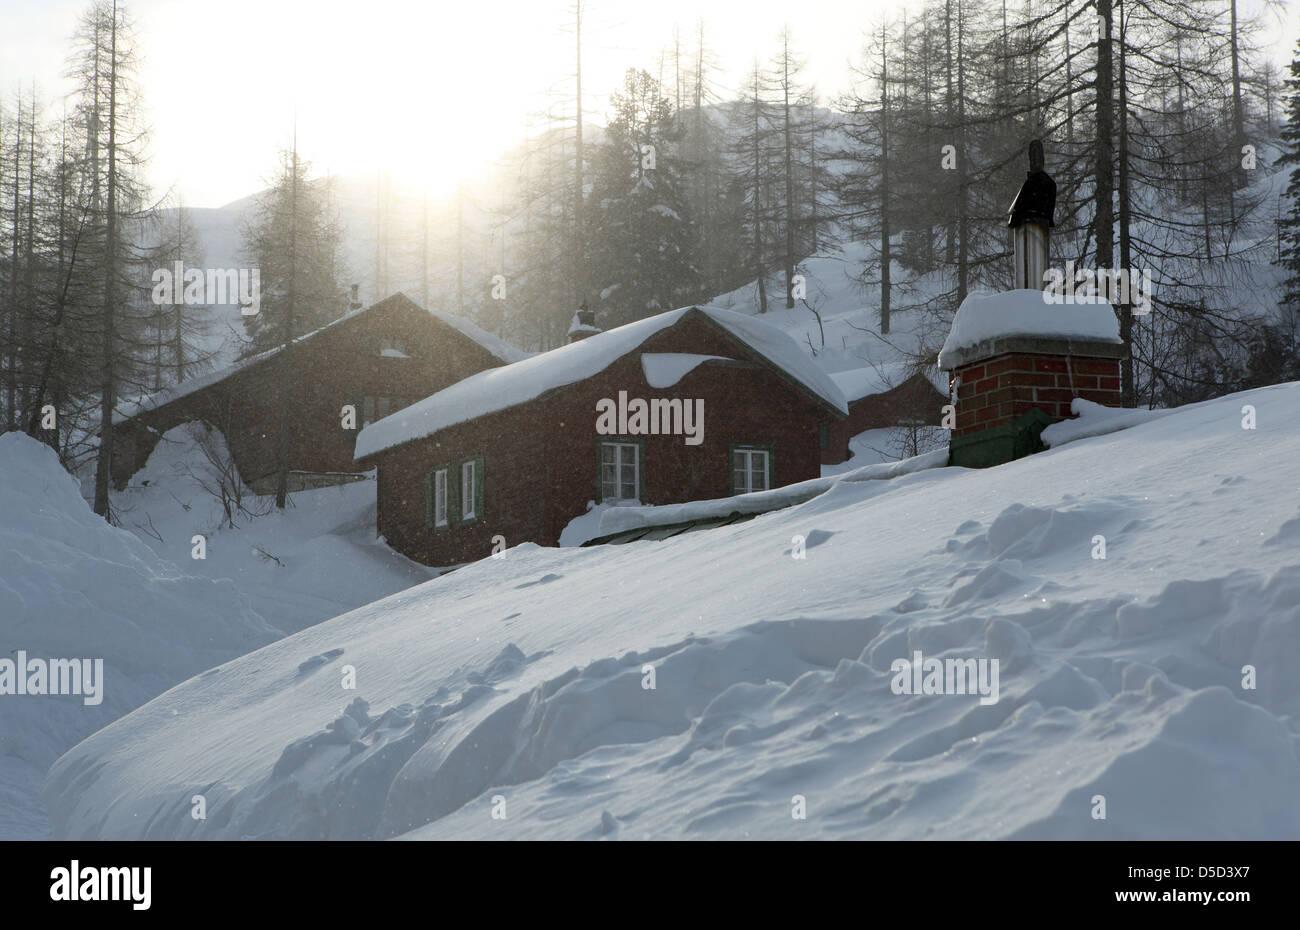 Krippenbrunn, Austria, snowed-in wooden huts - Stock Image